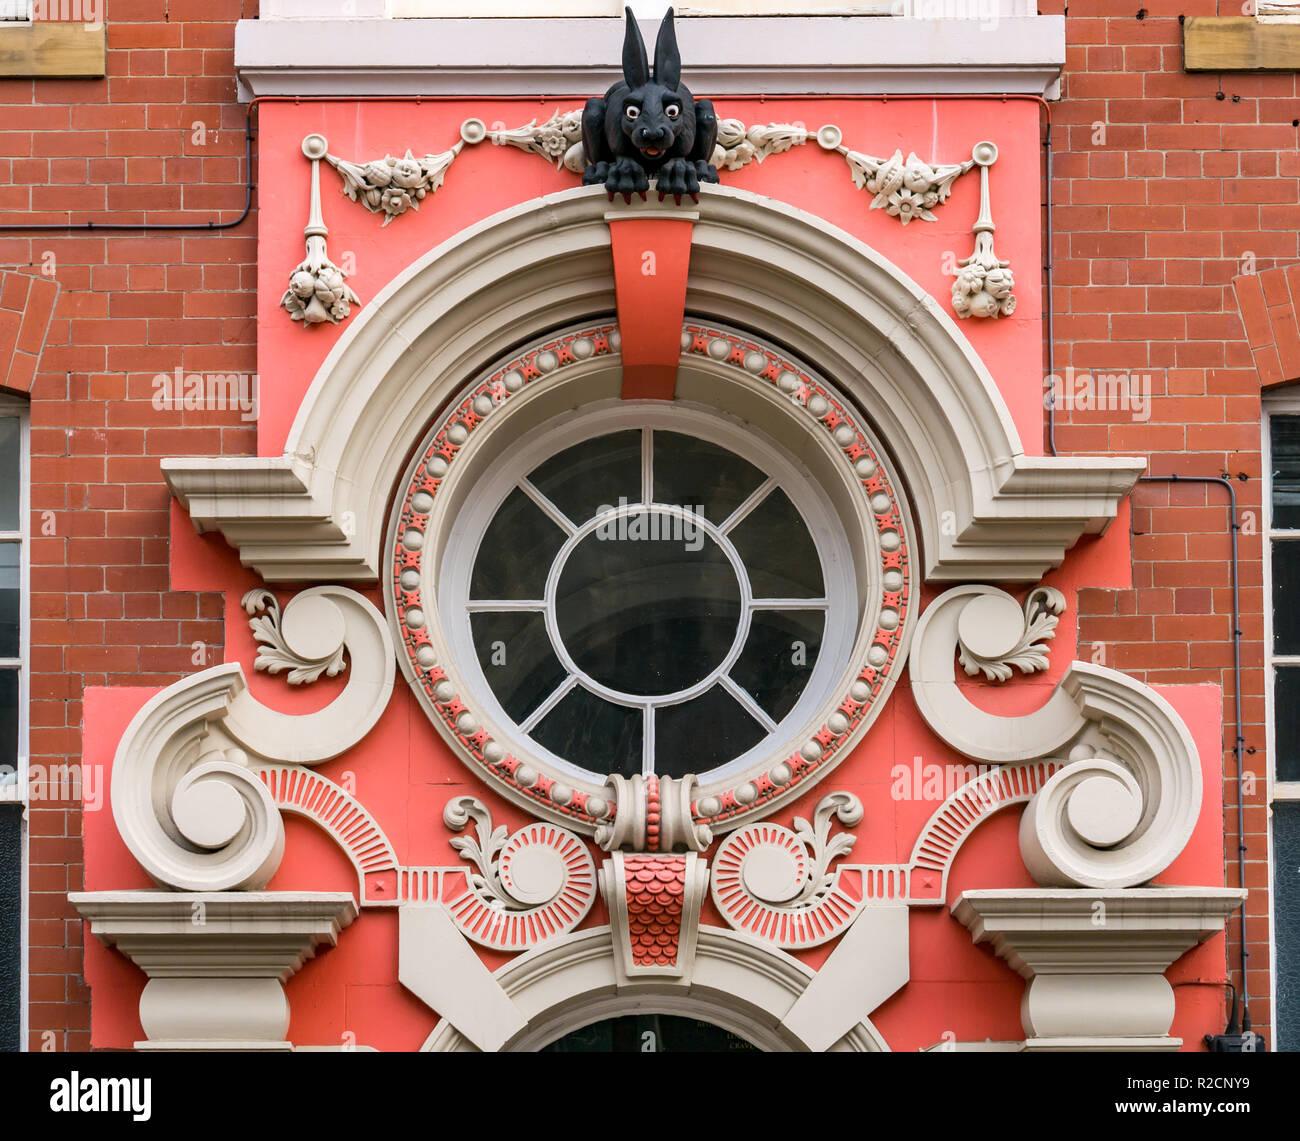 Ornate doorway Collingwood House with vampire rabbit and fanlight, Amen Corner, St Nicholas church yard buildings, Newcastle Upon Tyne, England, UK - Stock Image